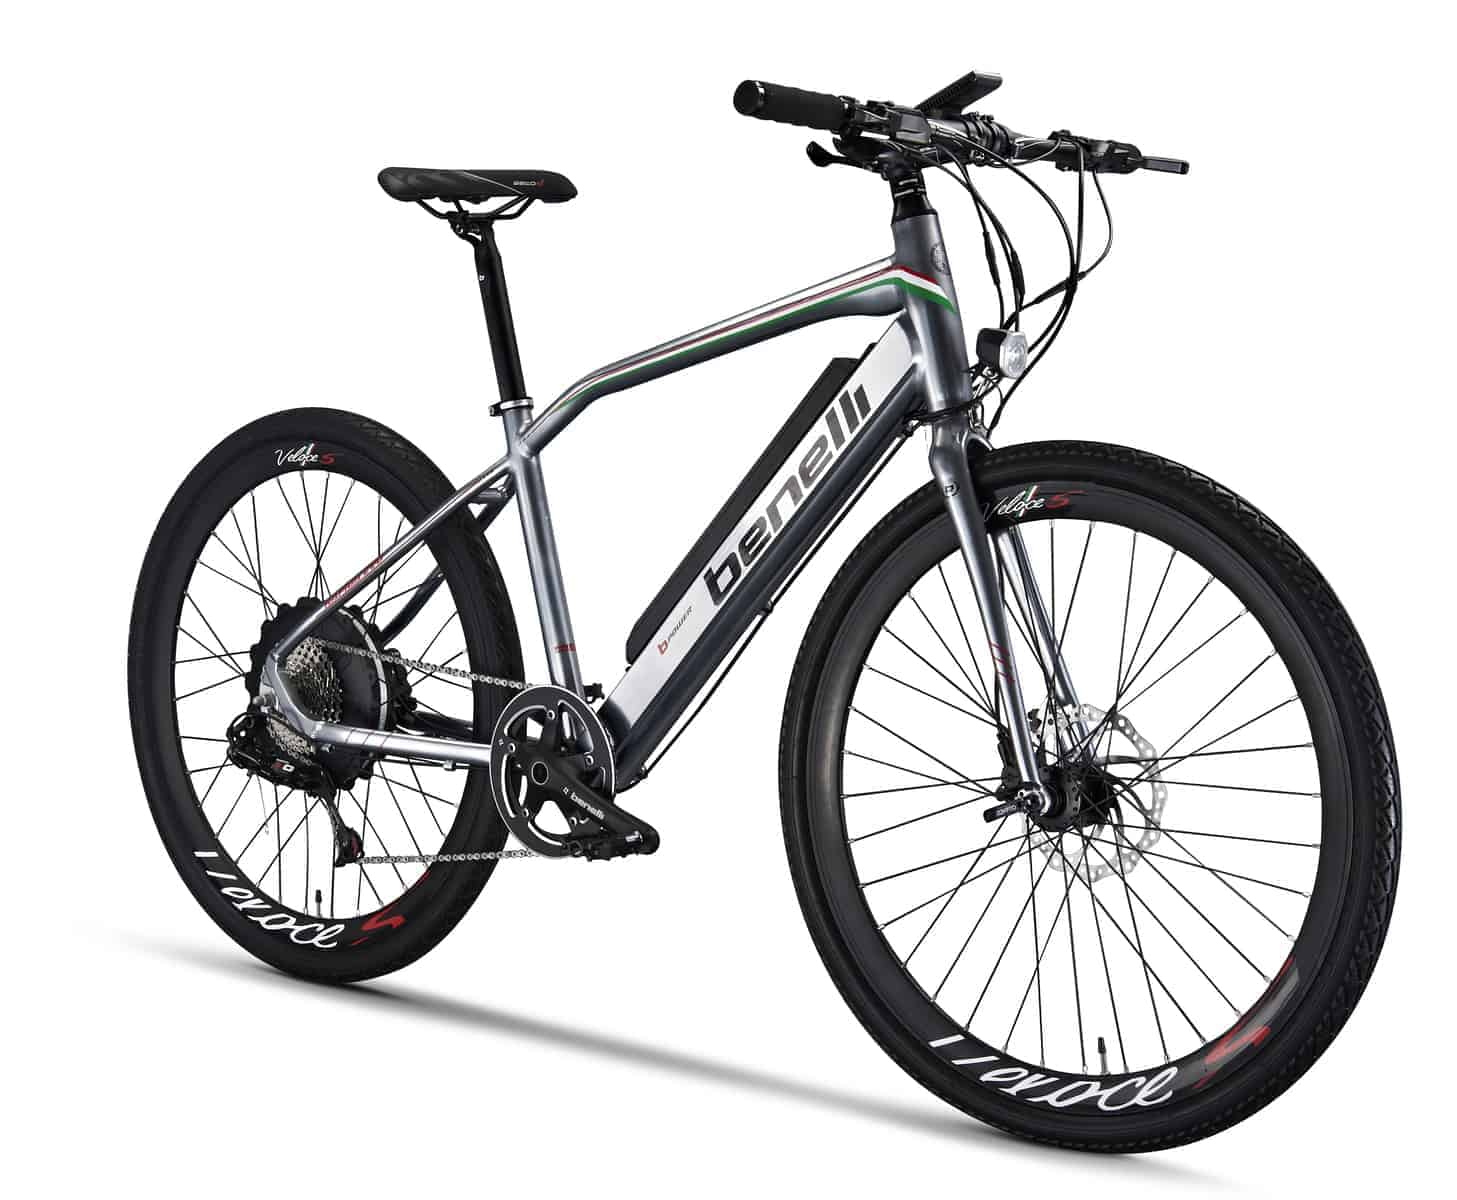 Benelli Premium Electric Bikes World Renowned Italian Design